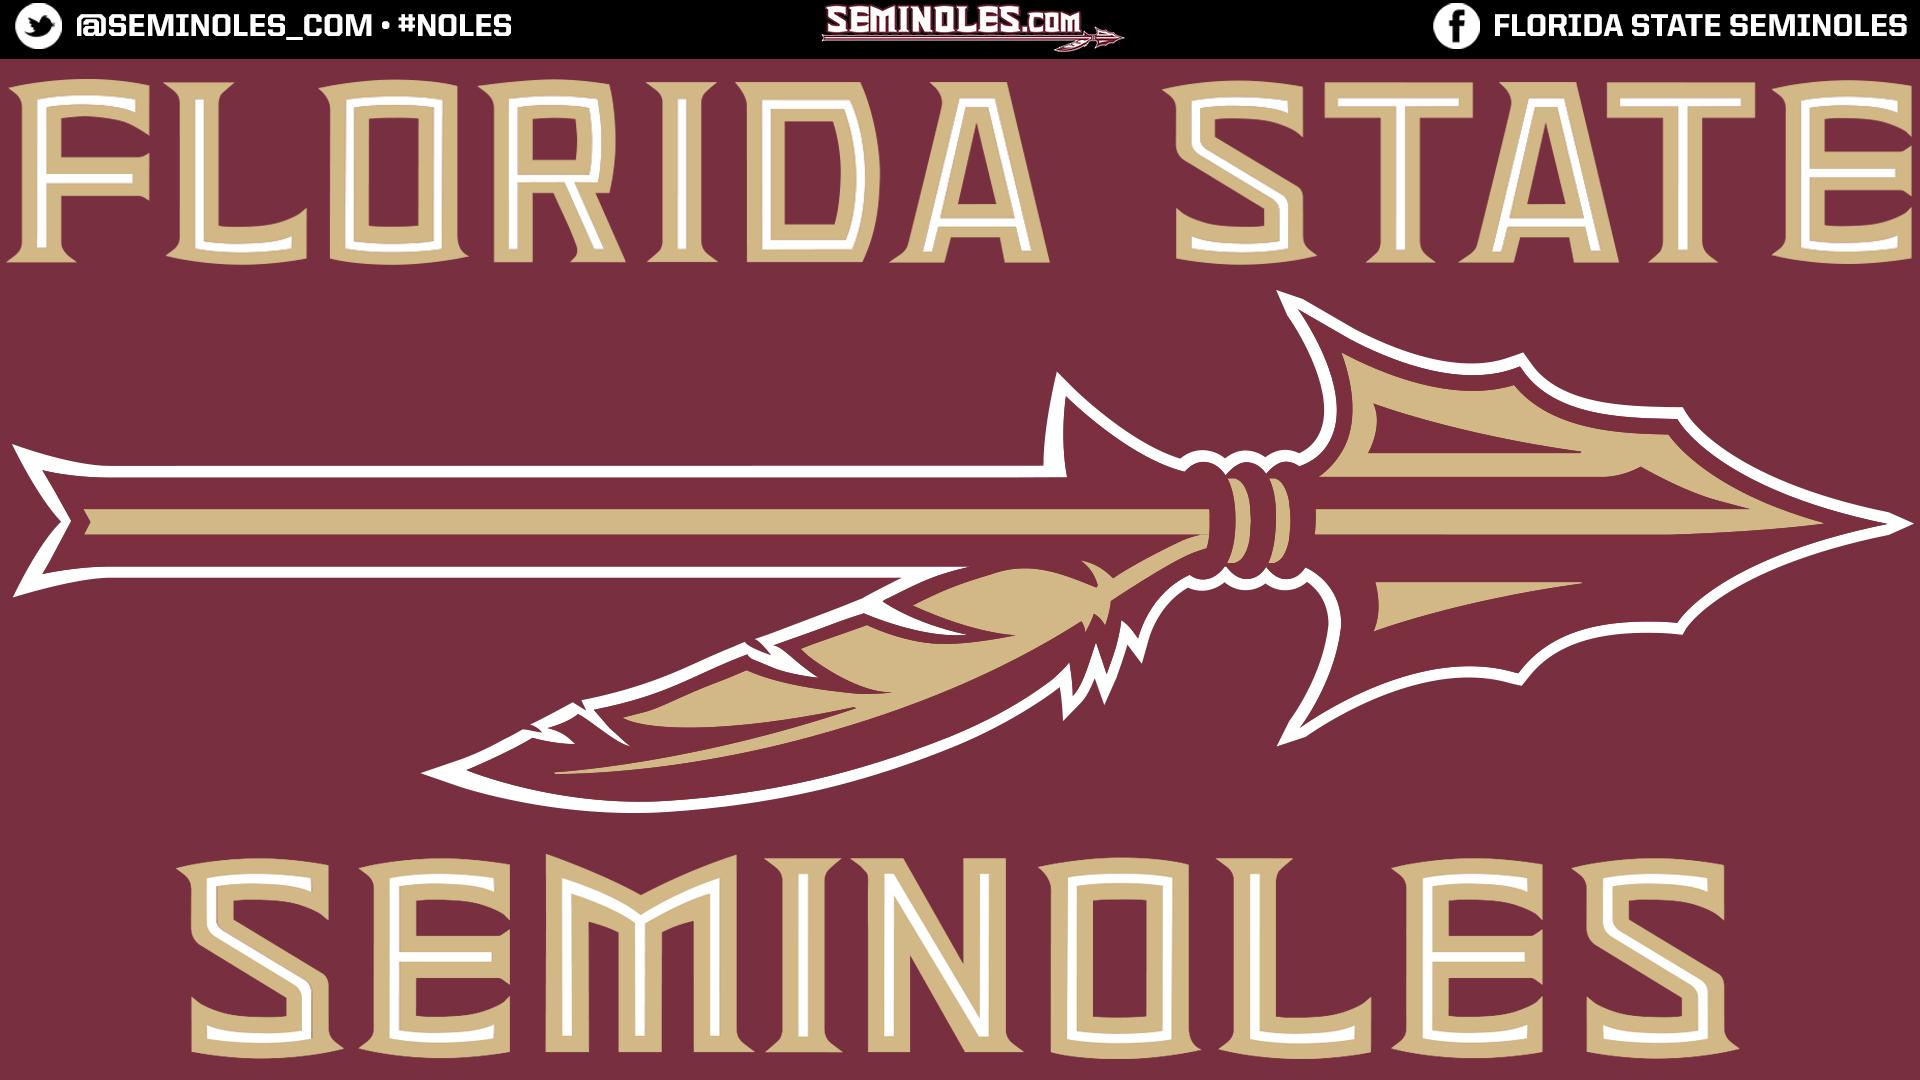 SEMINOLES COM DESKTOP WALLPAPERS - Florida State Seminoles